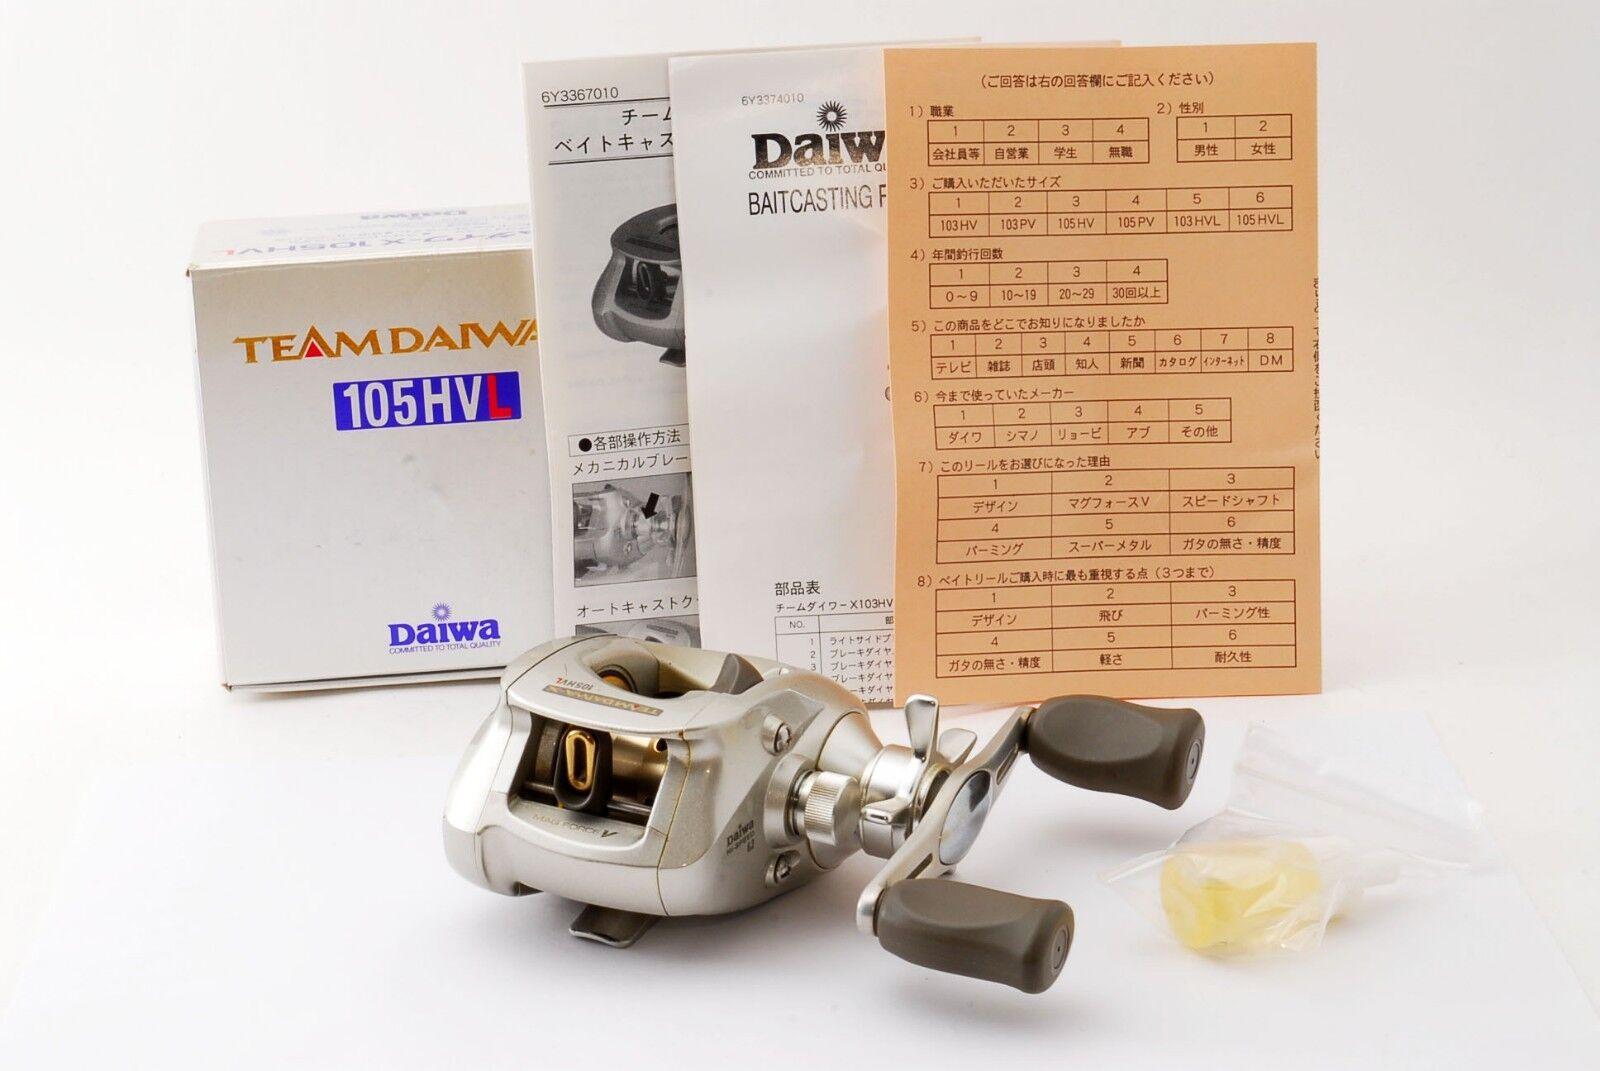 Daiwa TD-X 105HVL Baitcasting Left handed Baitcasting 105HVL Reel from Japan 【Excellent】 666747